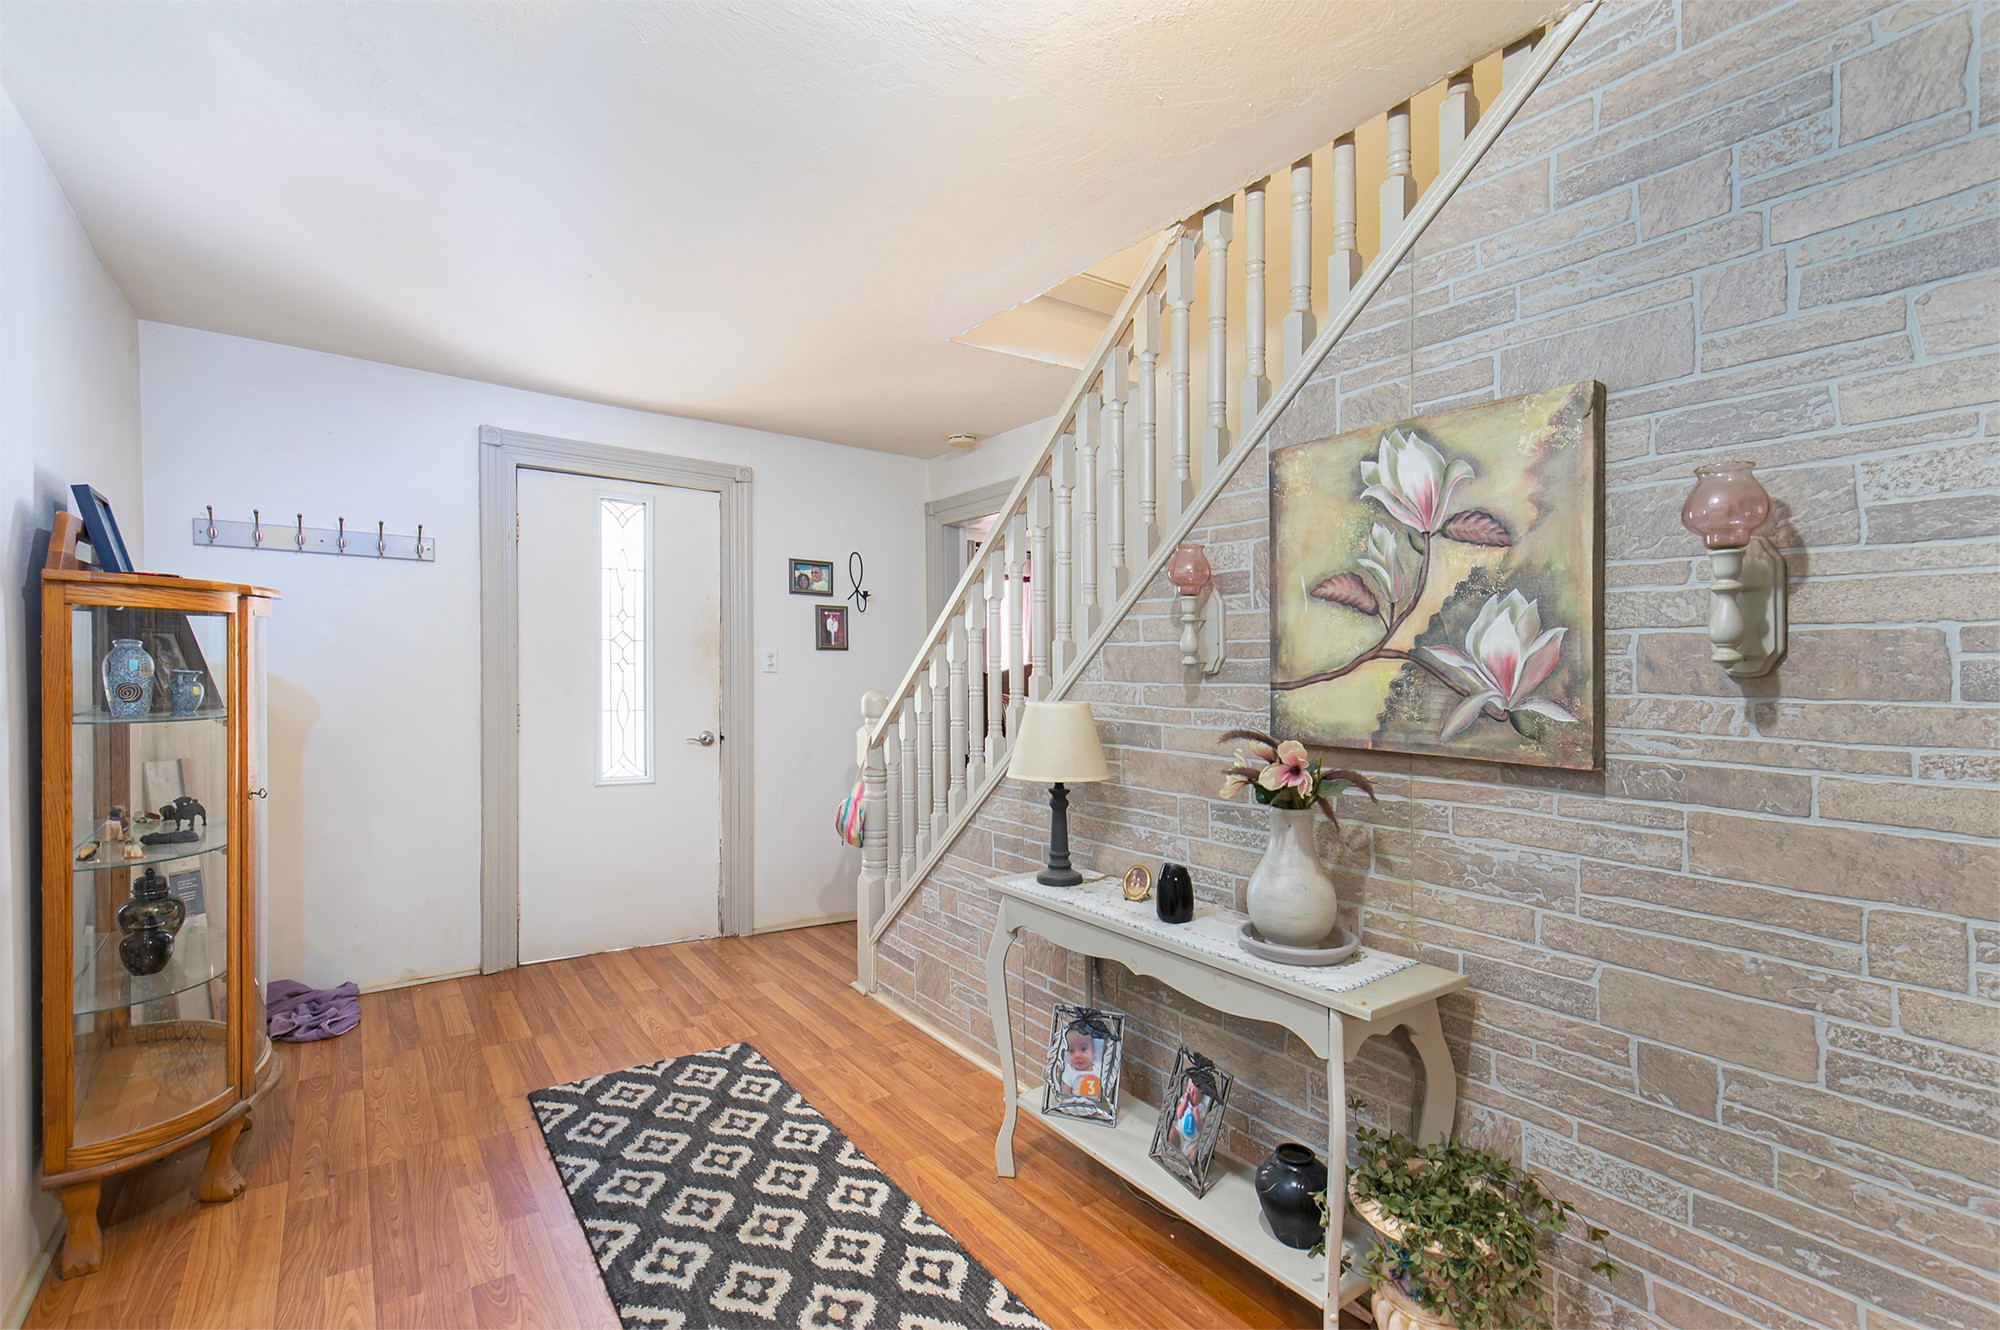 8 Grisham Ln Property Photo - Brush Creek, TN real estate listing